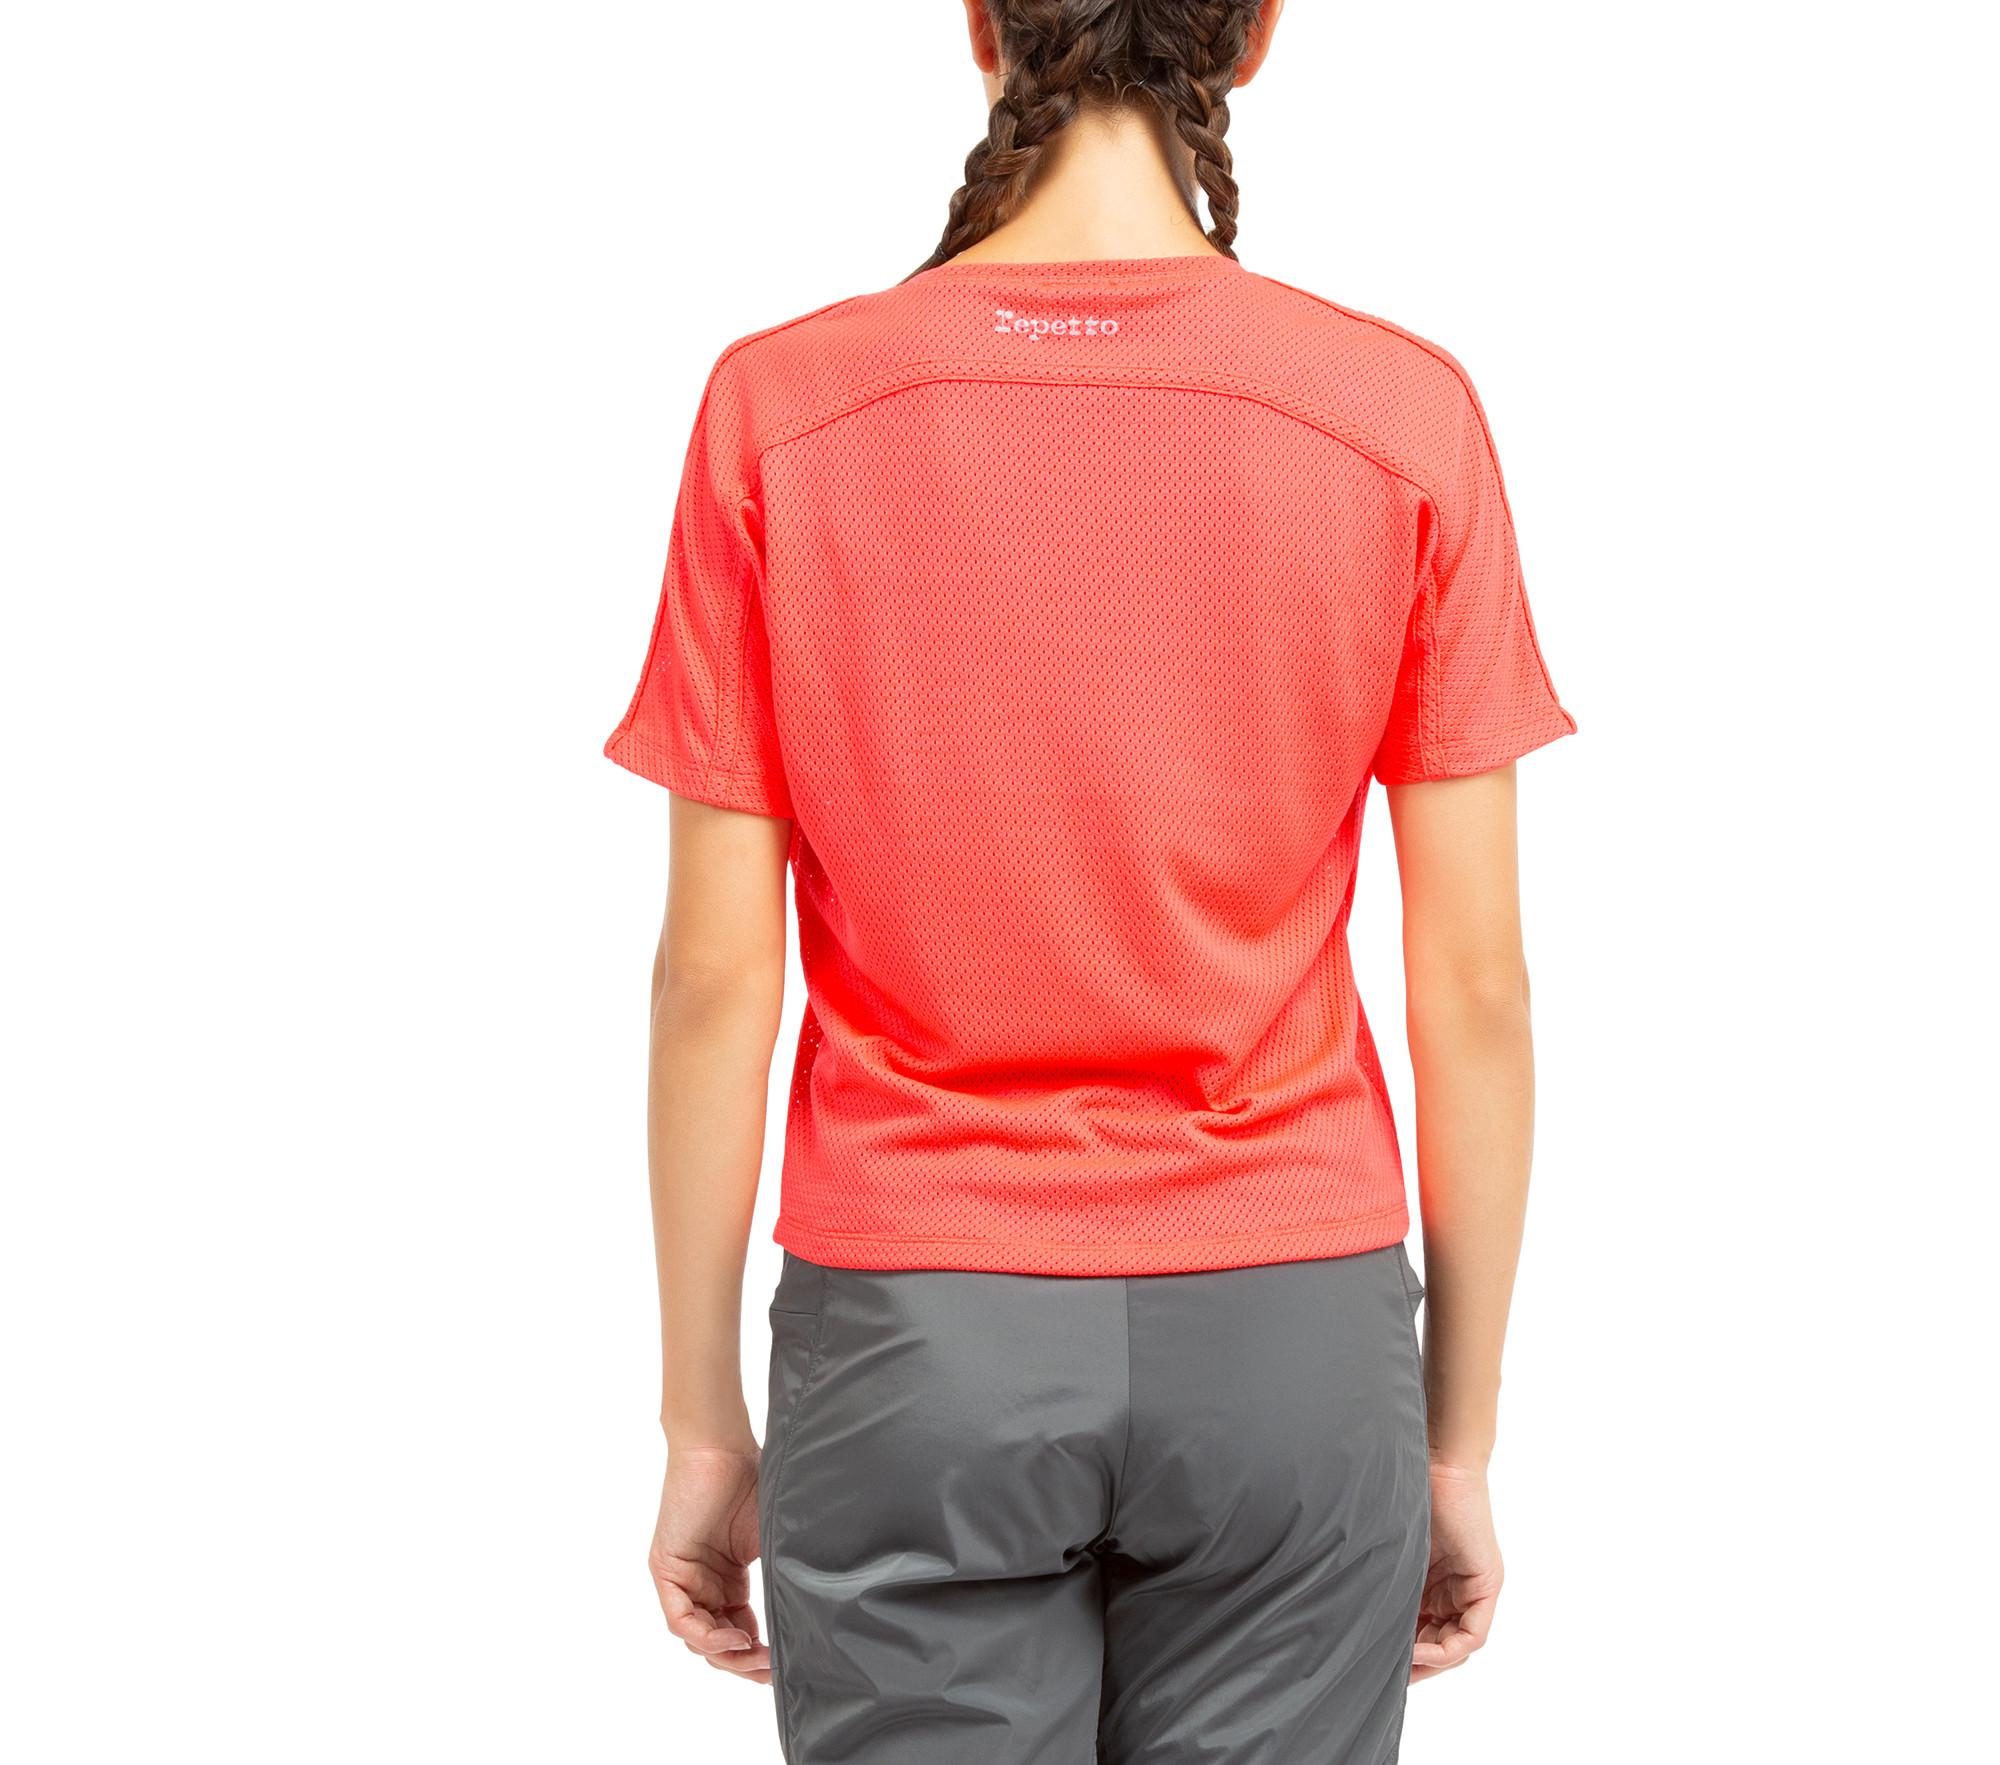 T-shirt in mesh traspirante